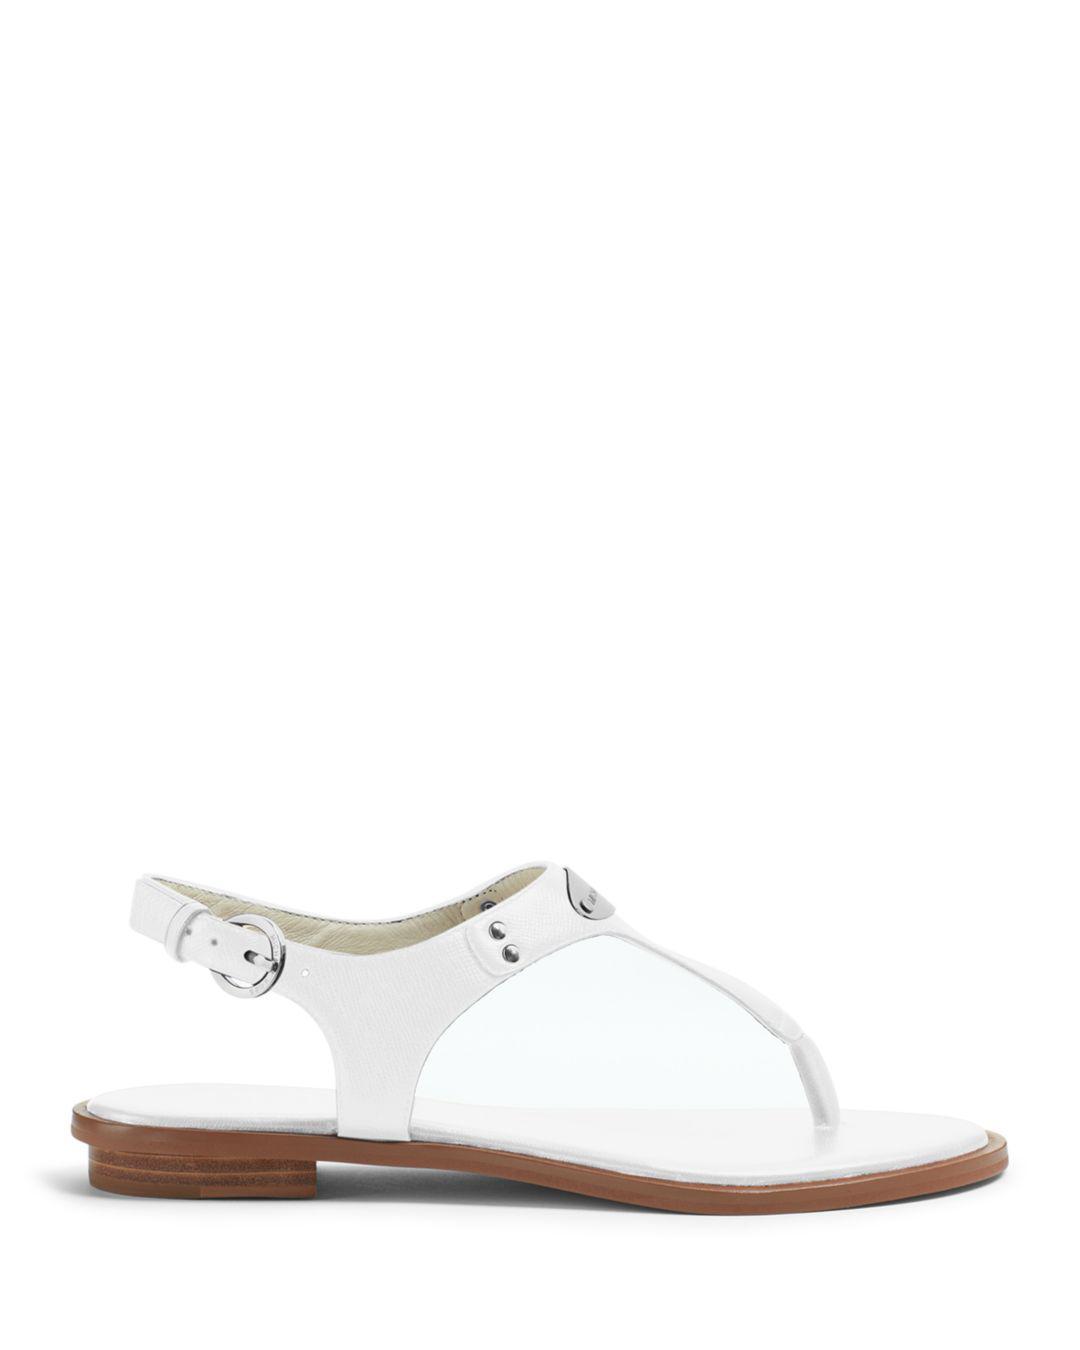 4de6bfe627b MICHAEL Michael Kors Mk Plate Thong Sandals - Lyst